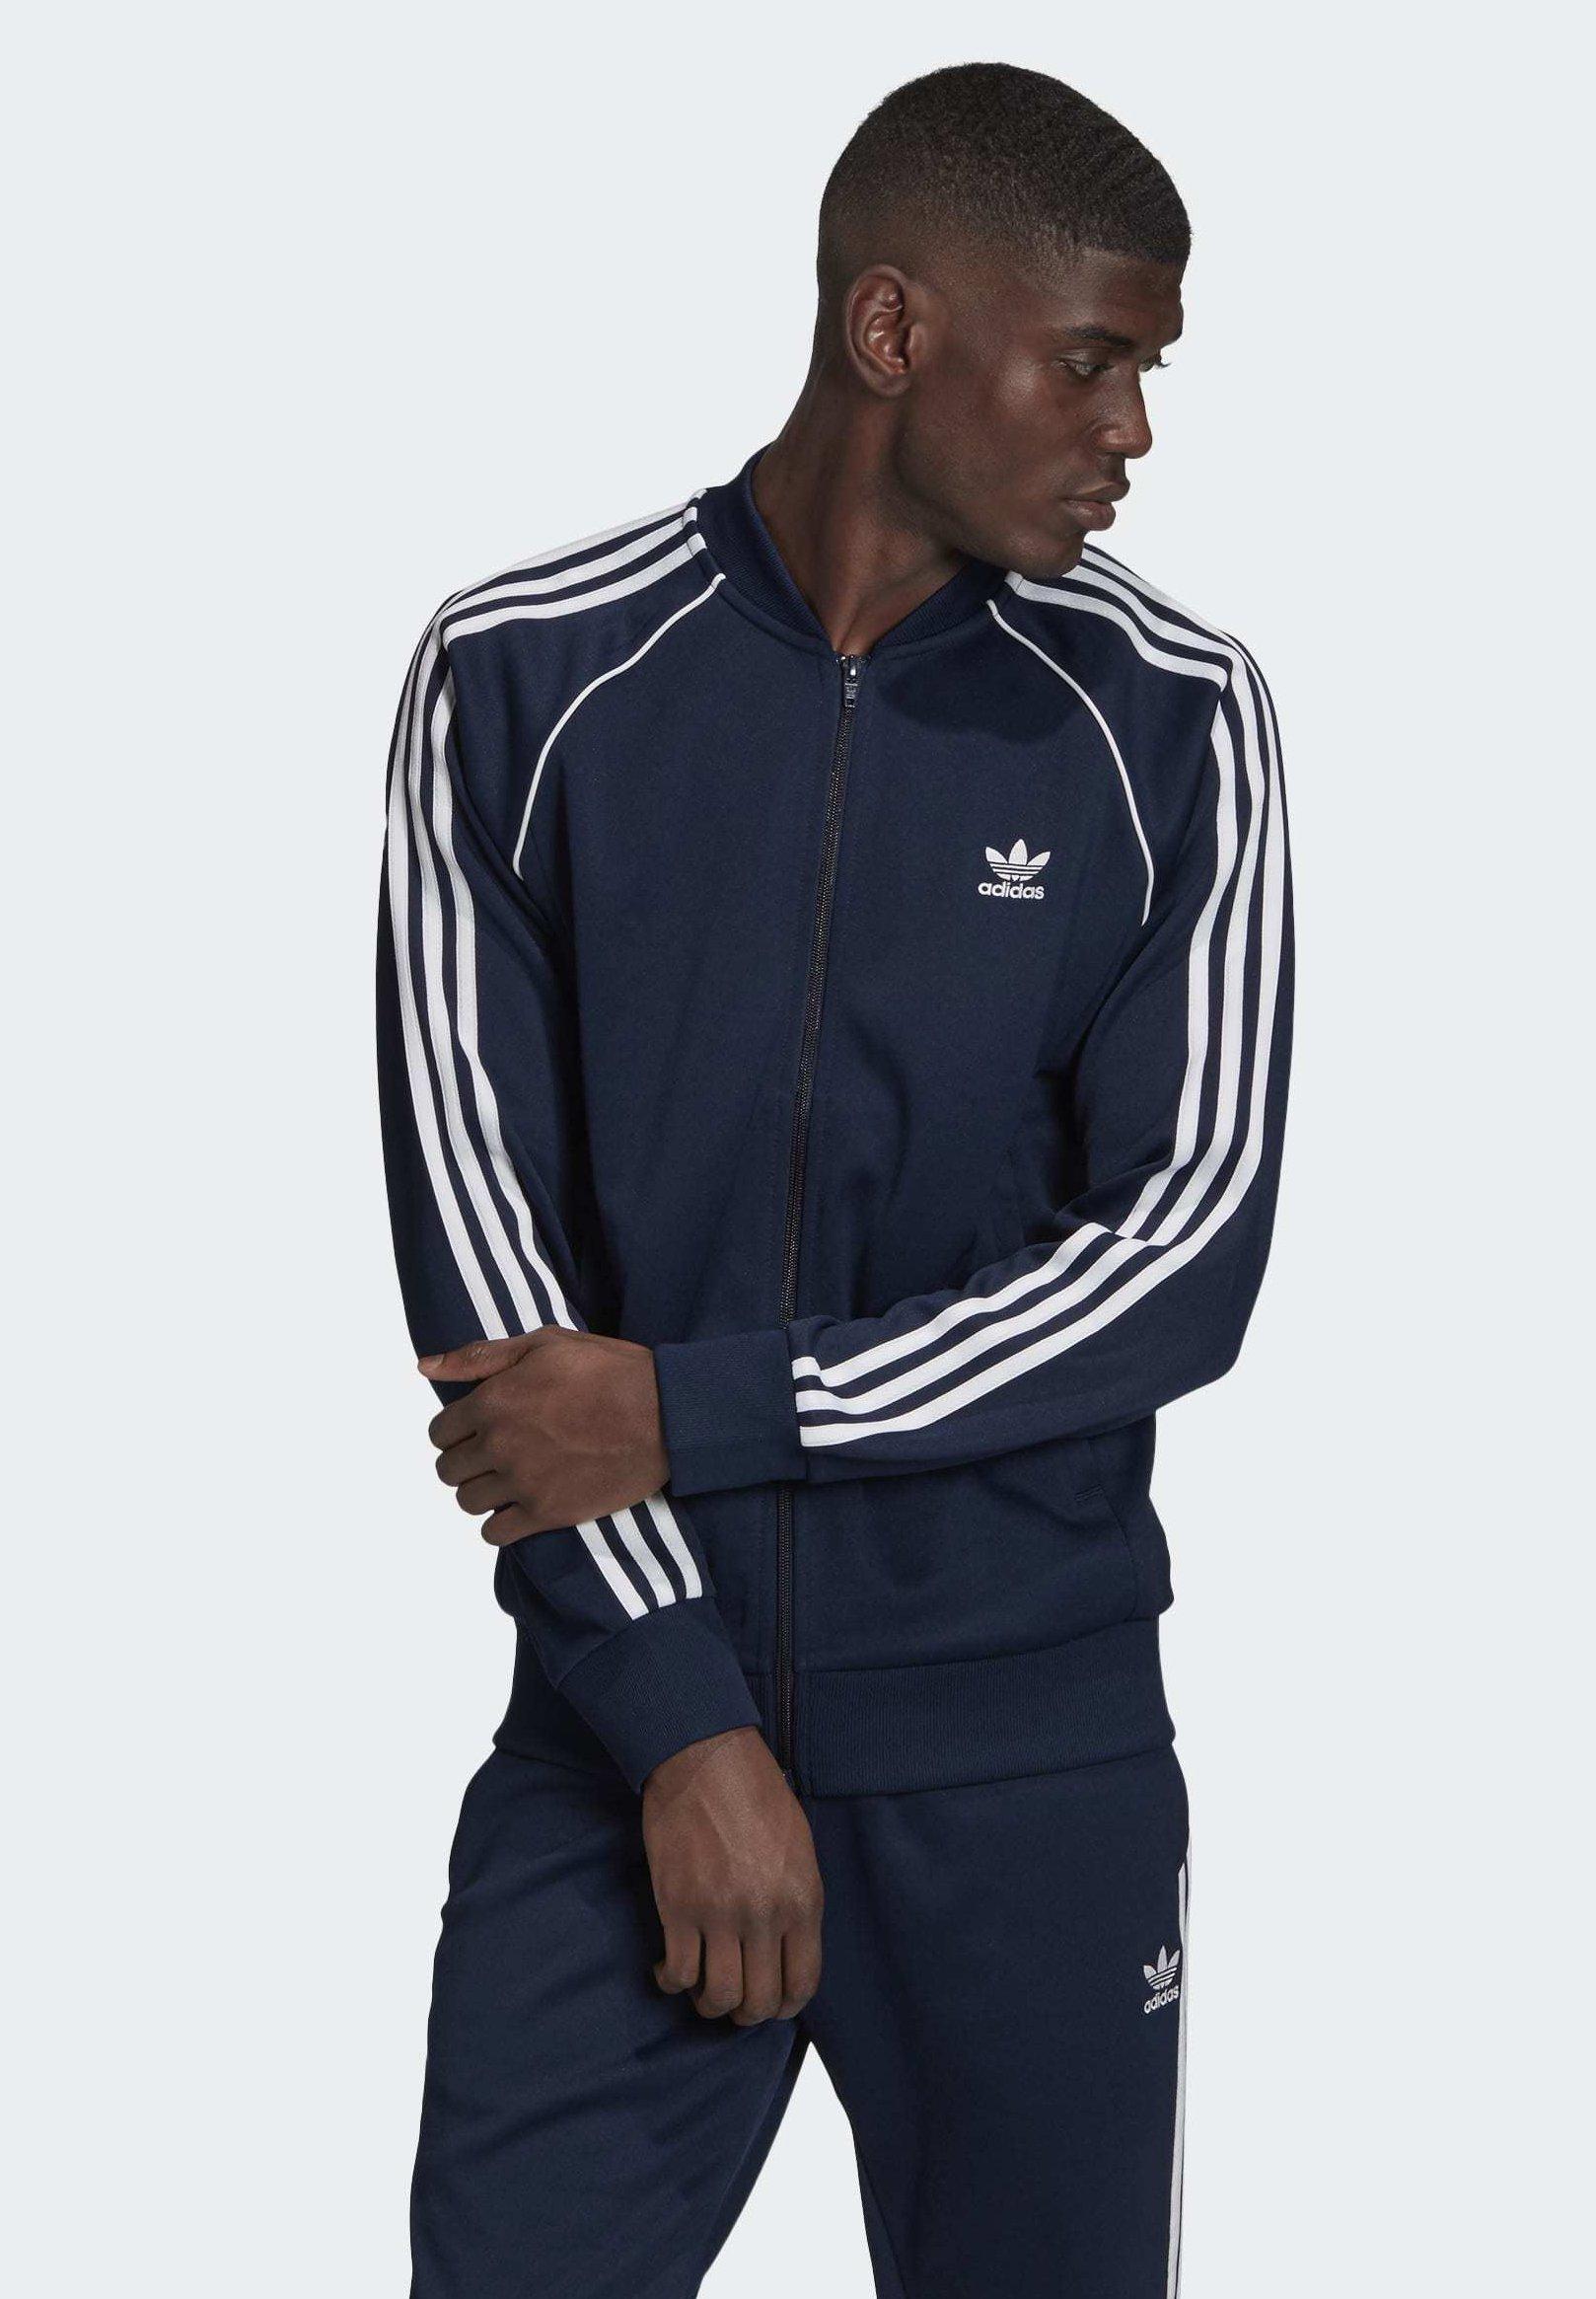 Mirilla Constituir Comunismo  adidas Originals ADICOLOR CLASSICS PRIMEBLUE SST TRACK TOP - Training  jacket - blue - Zalando.co.uk